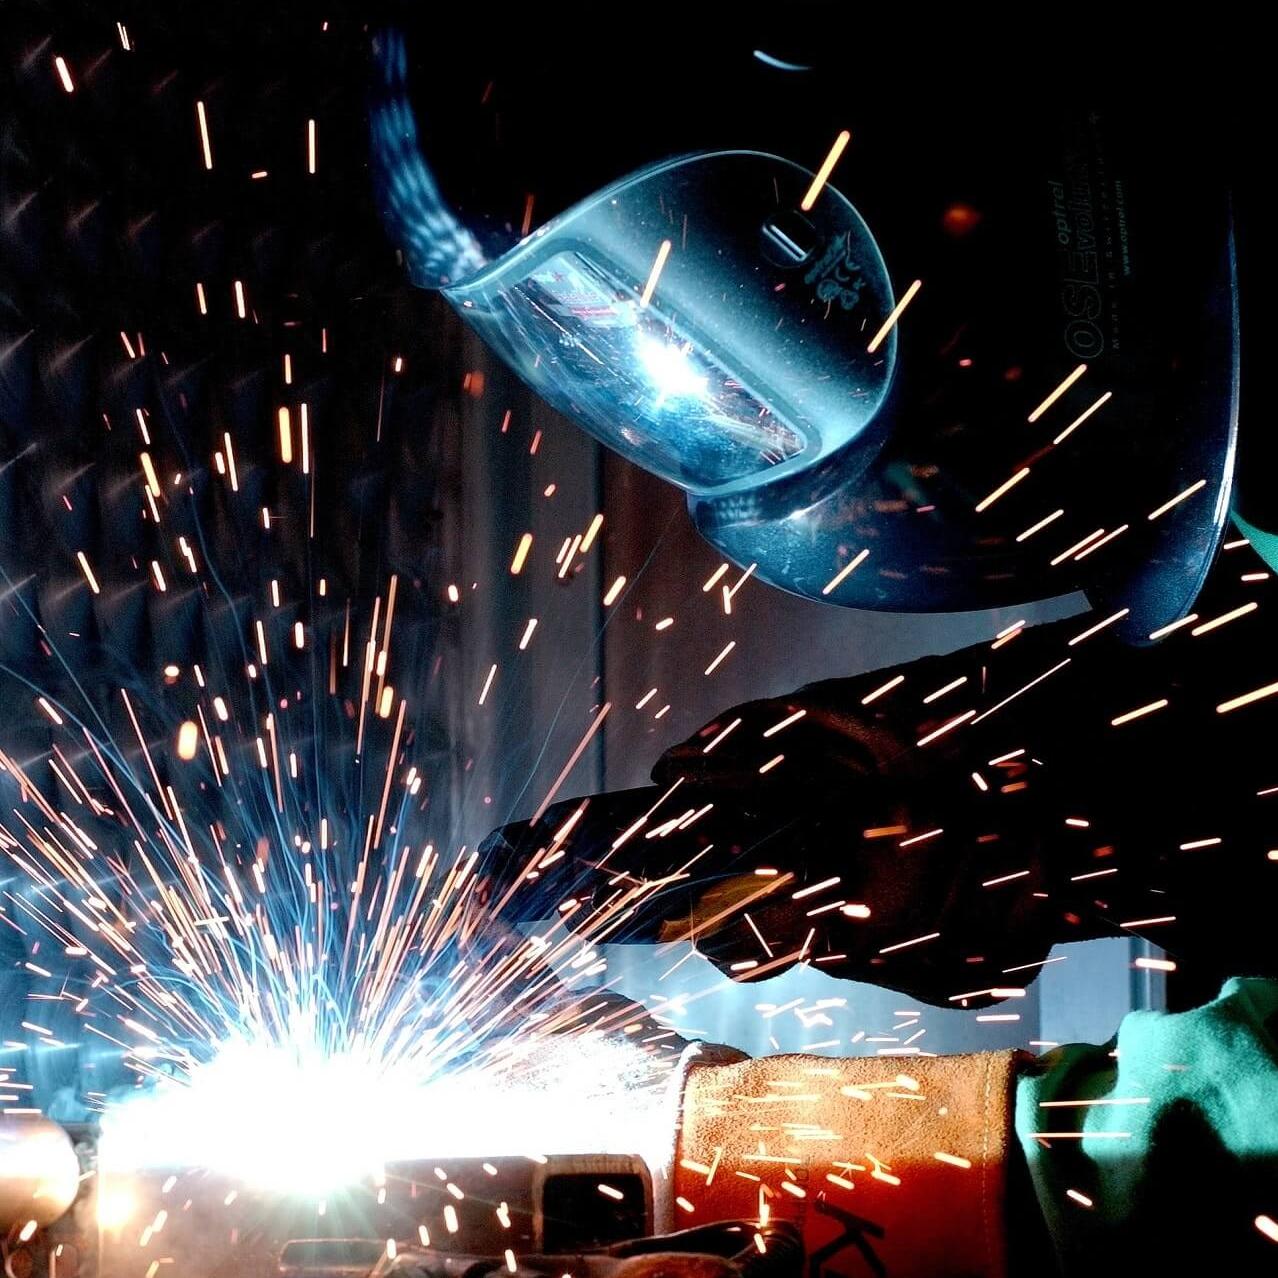 Metalverarbeitung